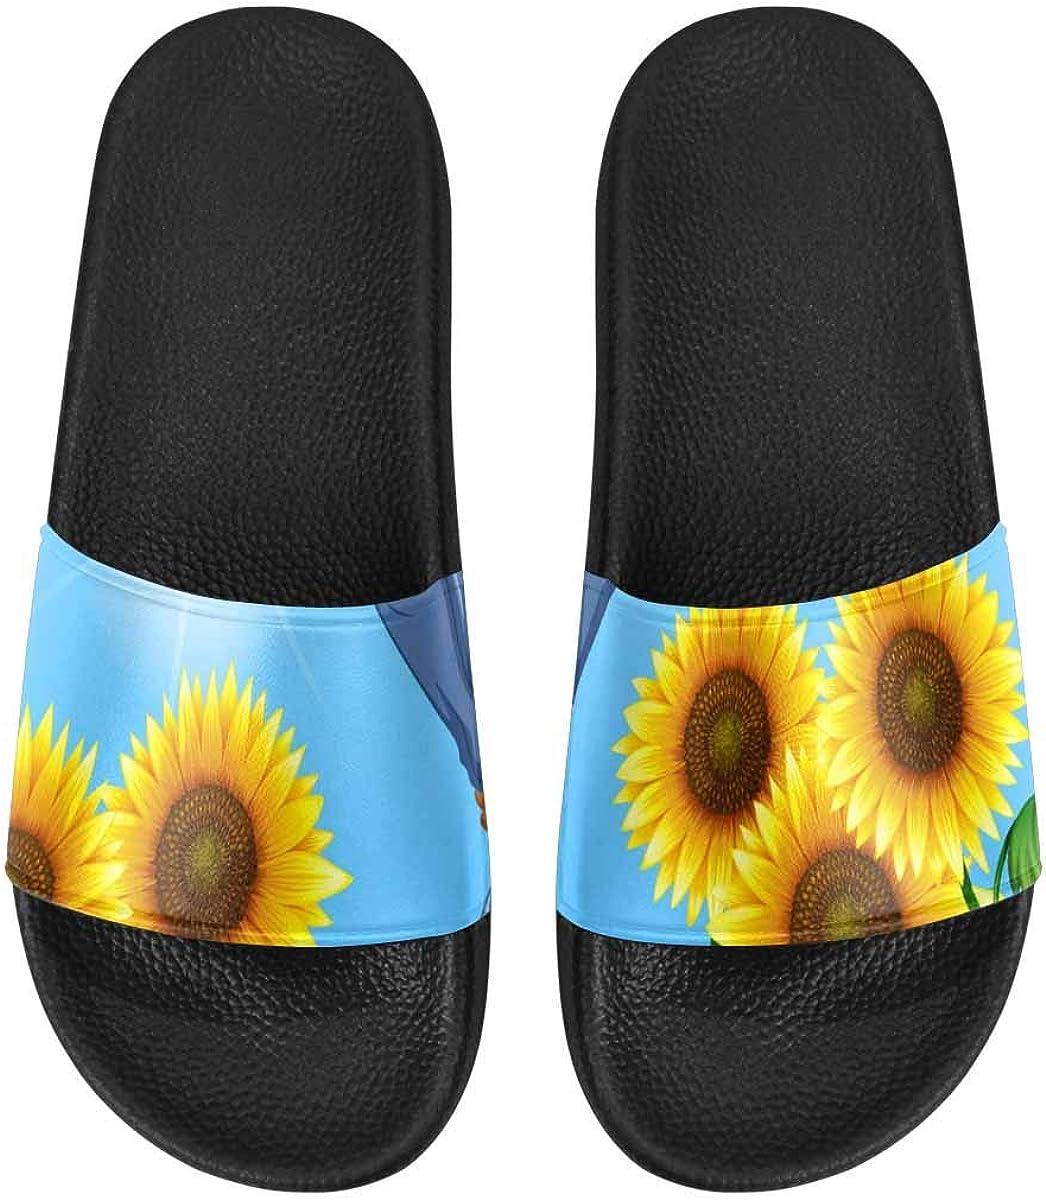 InterestPrint Women's Stylish Slipper Sandals for Summer Roses Poppies Daisies